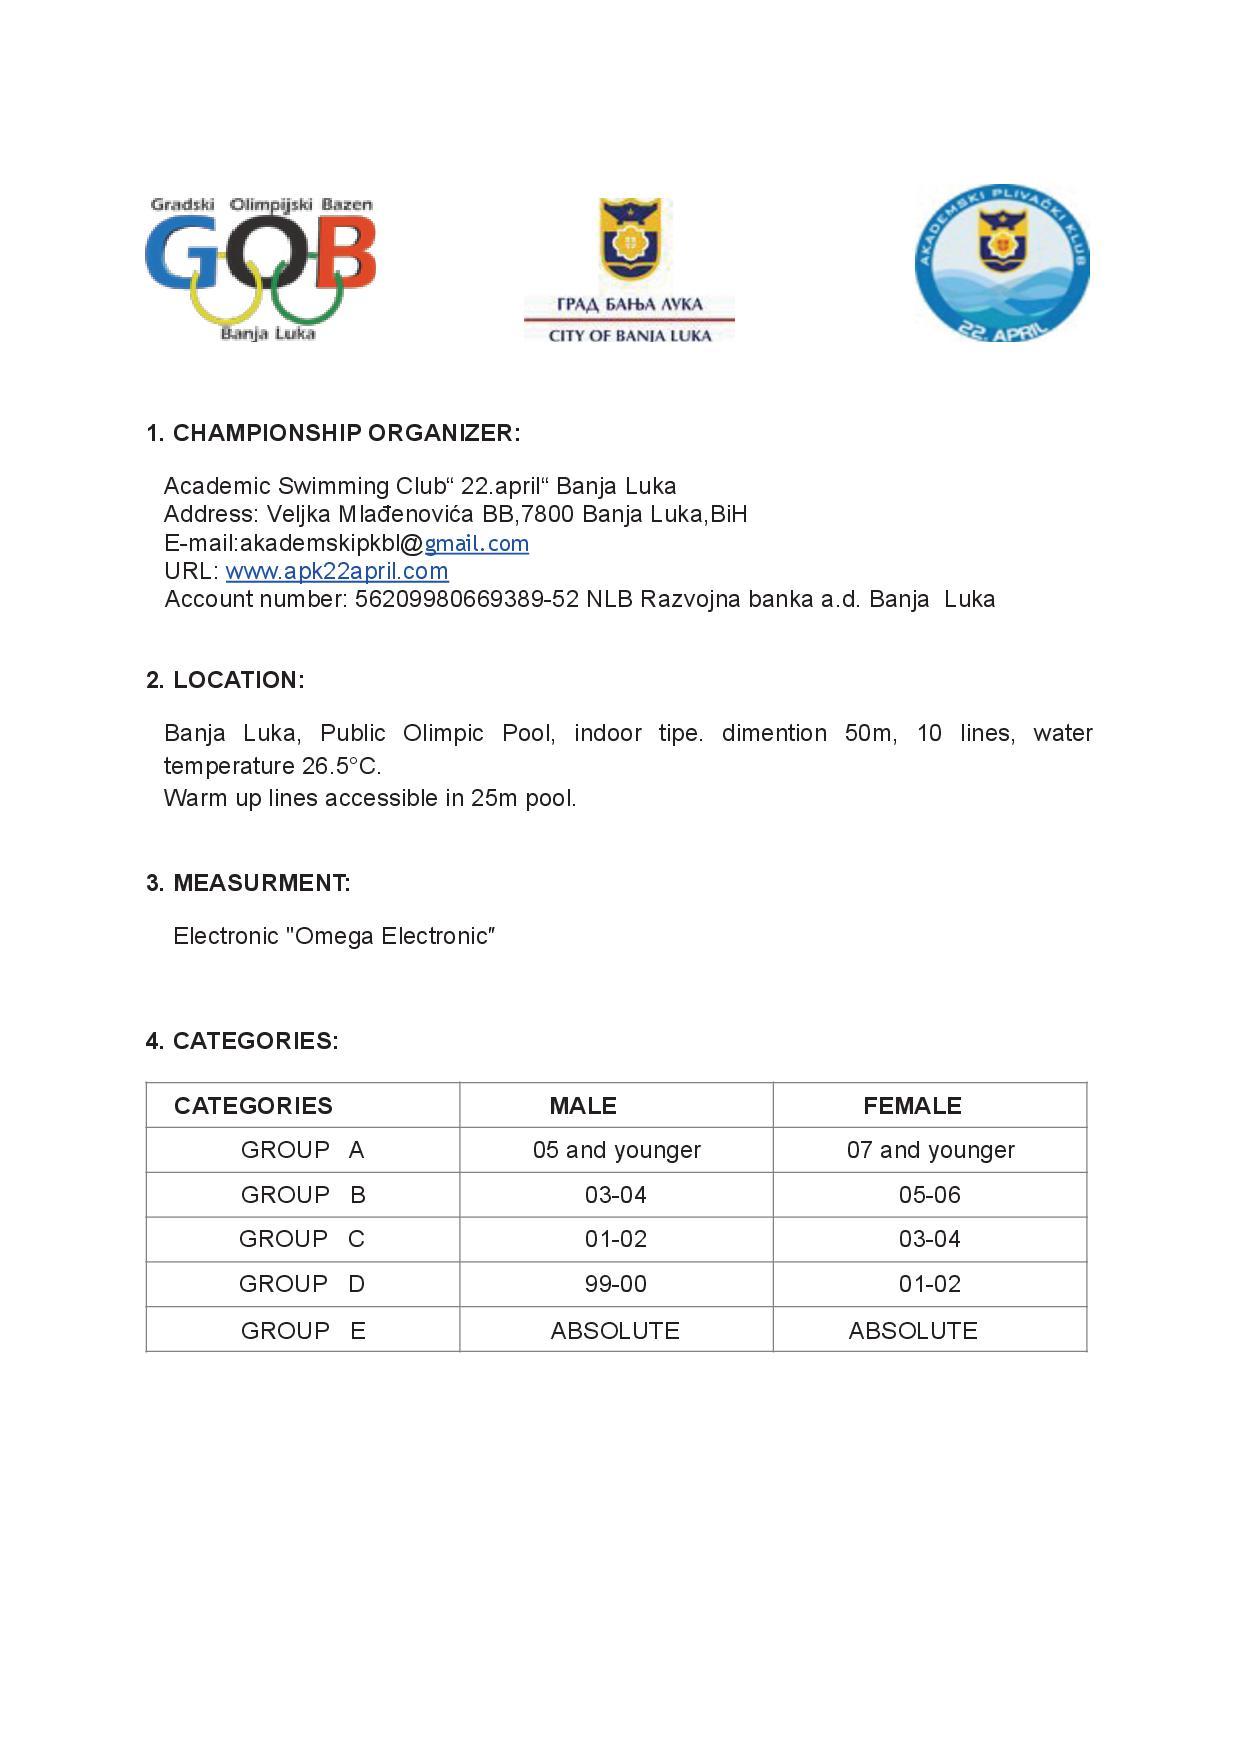 Original proposition of organizer, Page 2